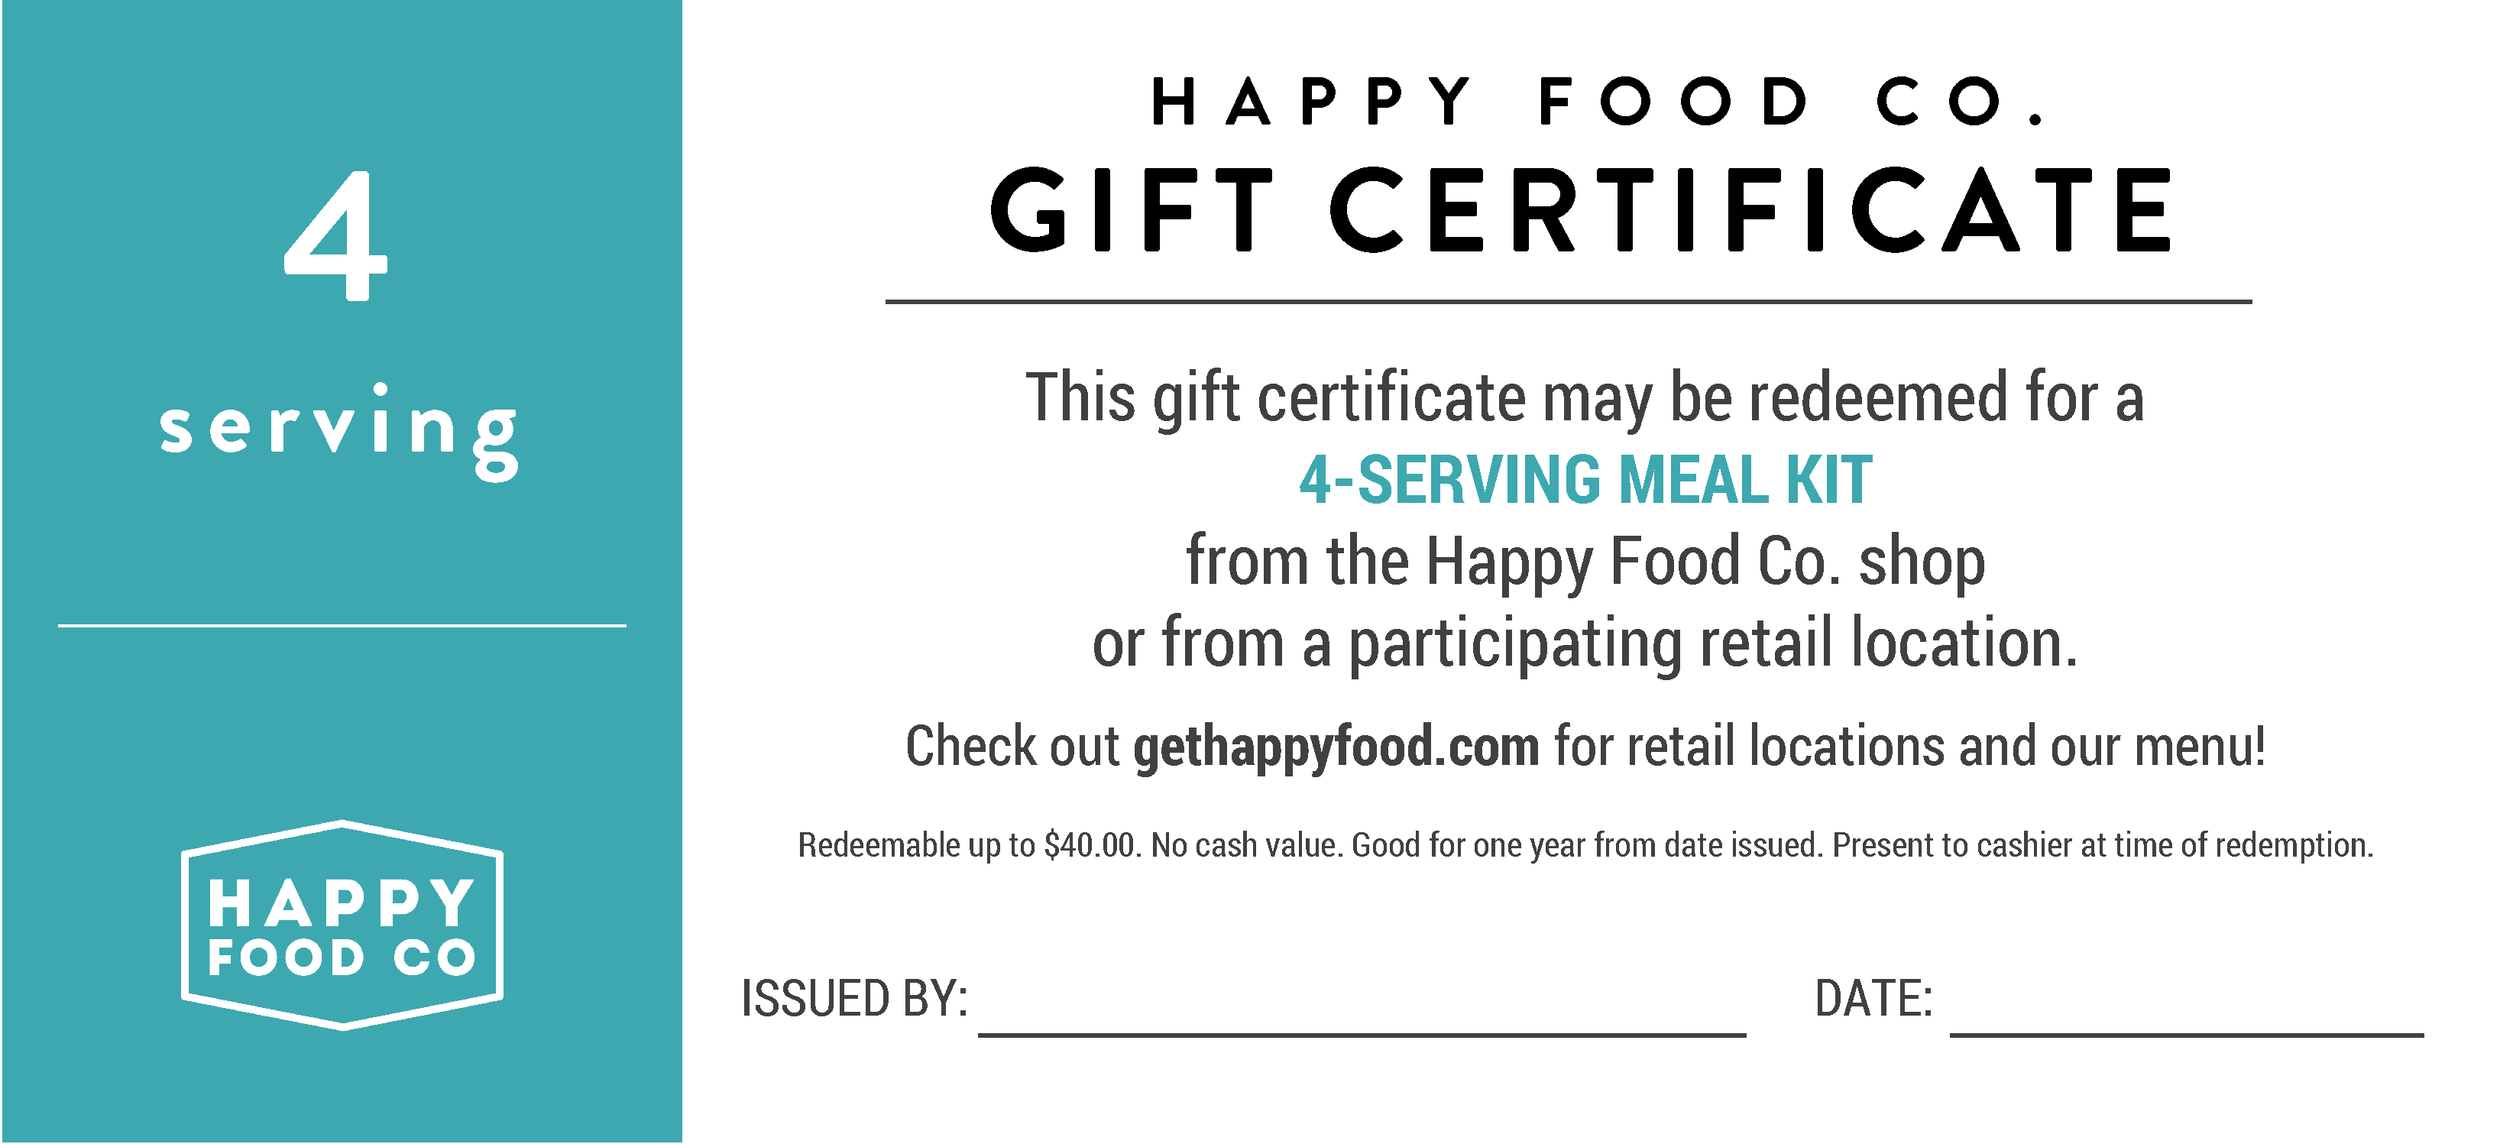 Gift Certificate 4-Serving Screenshot-02.png